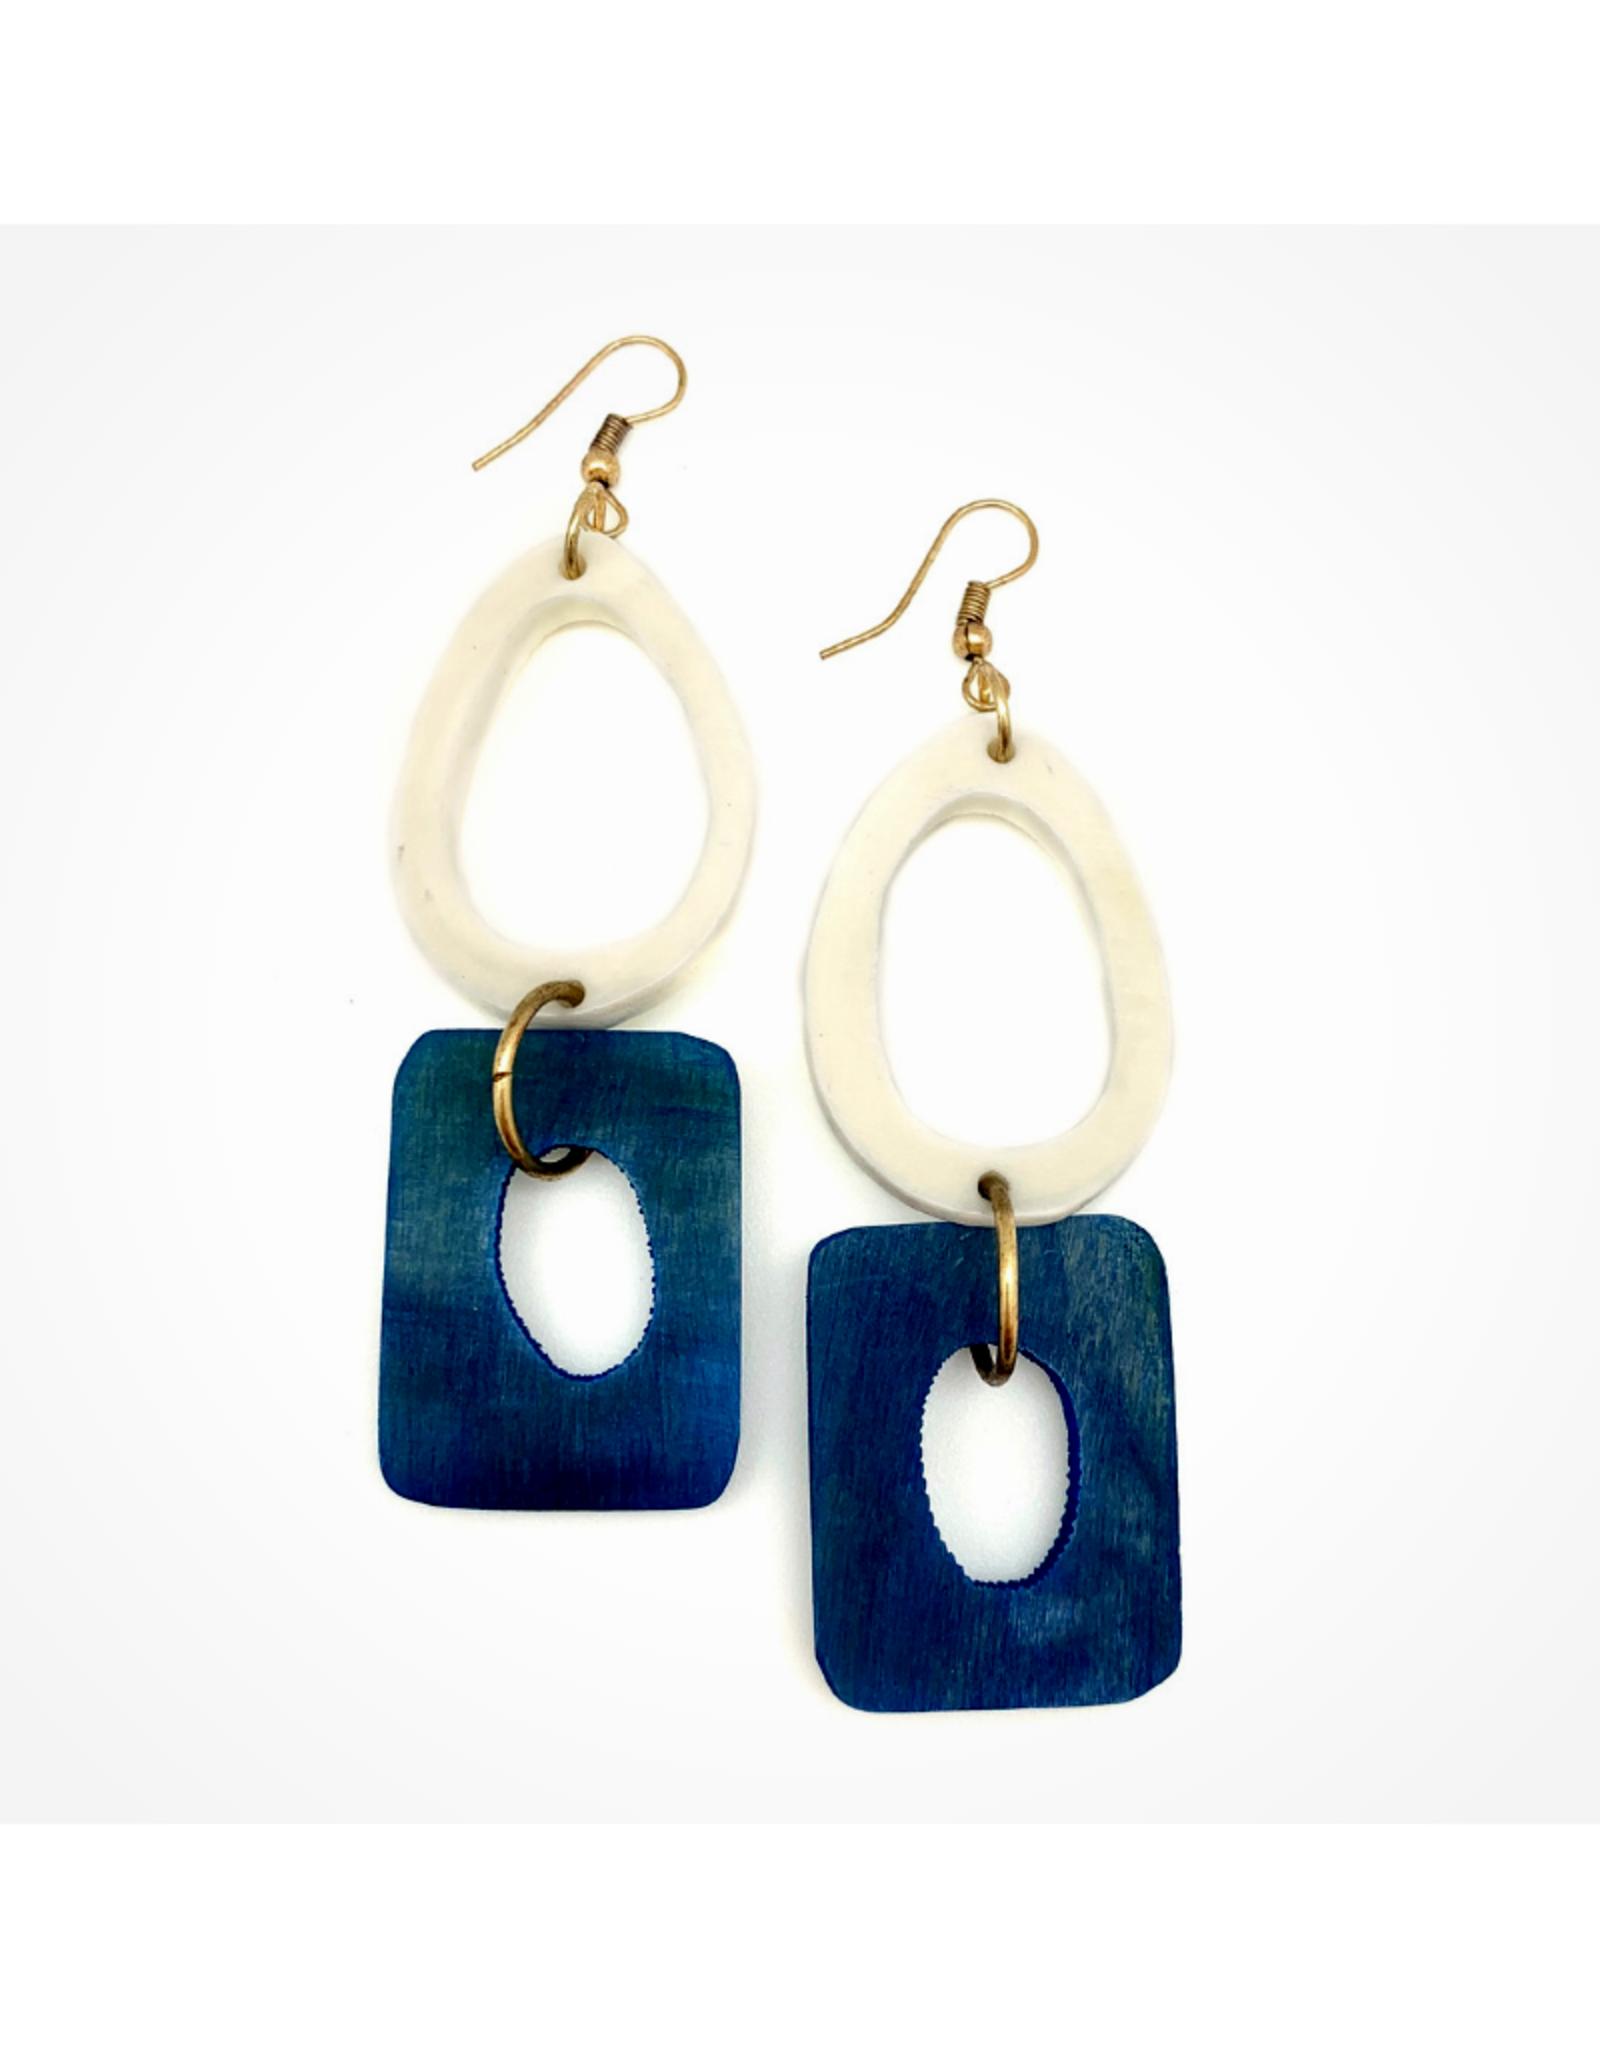 Faire/Anju Jewelry EARRINGS-OMALA AZURE COAST